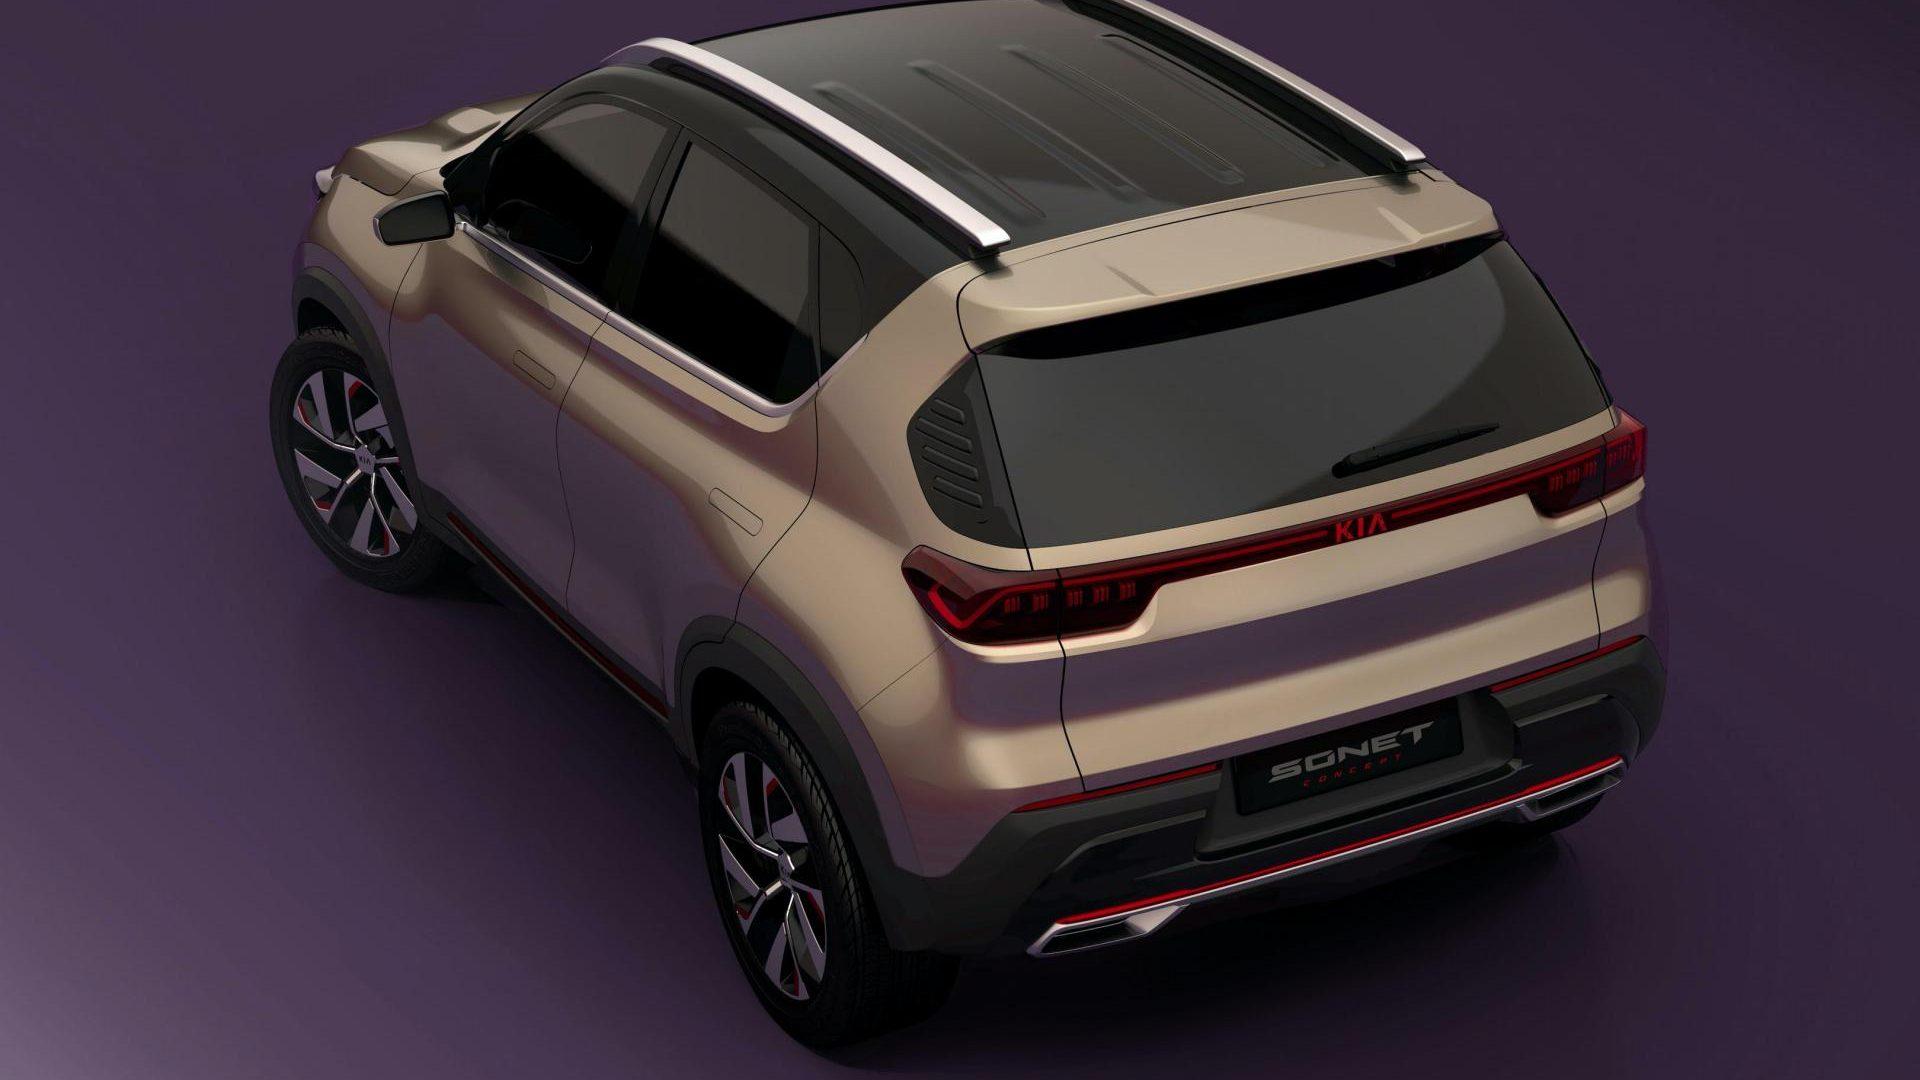 2020-Kia-Sonet-Concept-05